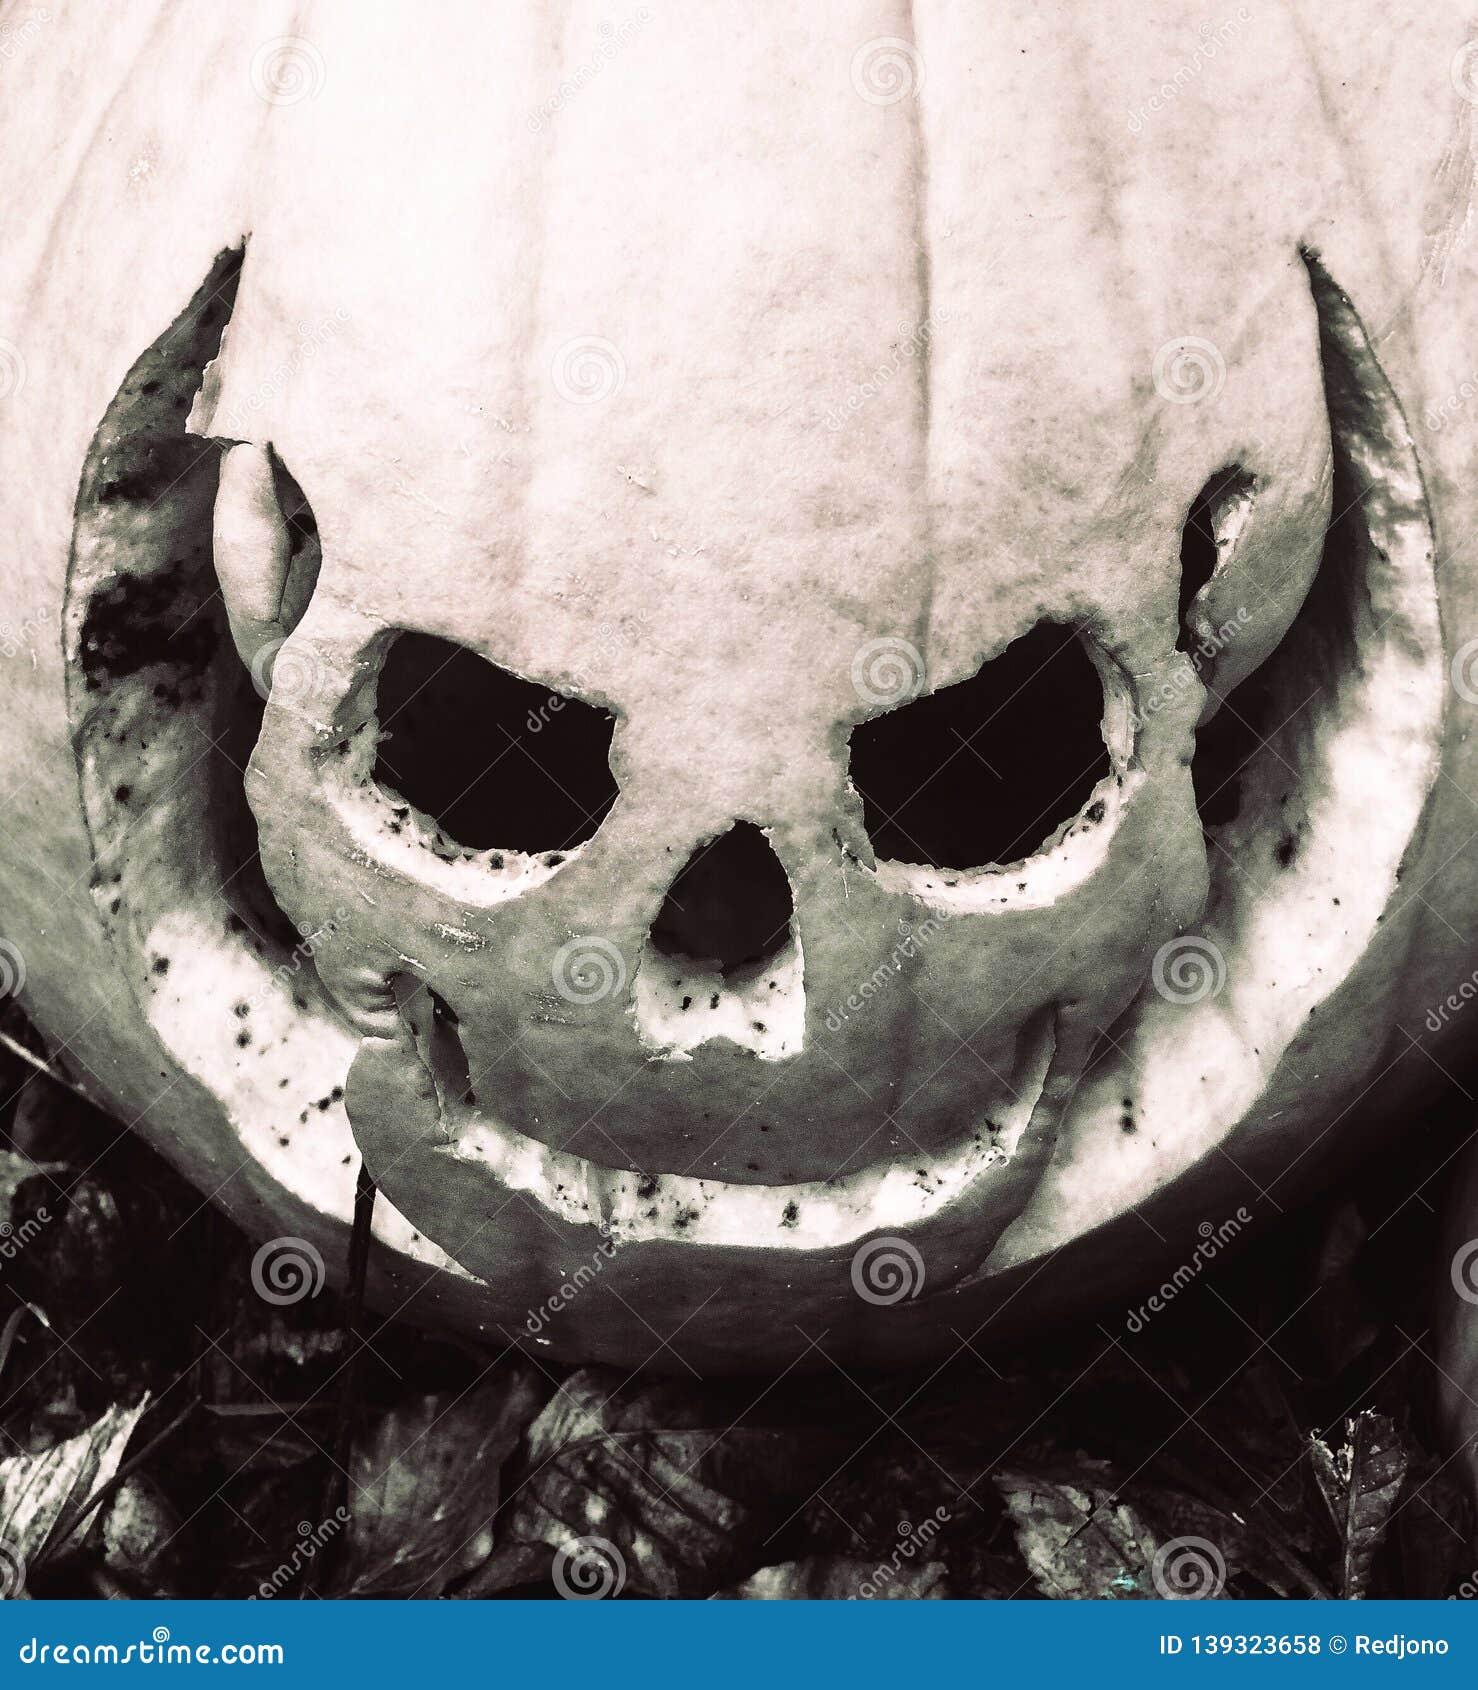 Jack O Lantern Pumpkin Halloween Skull Stock Photo Image Of Orange Holiday 139323658